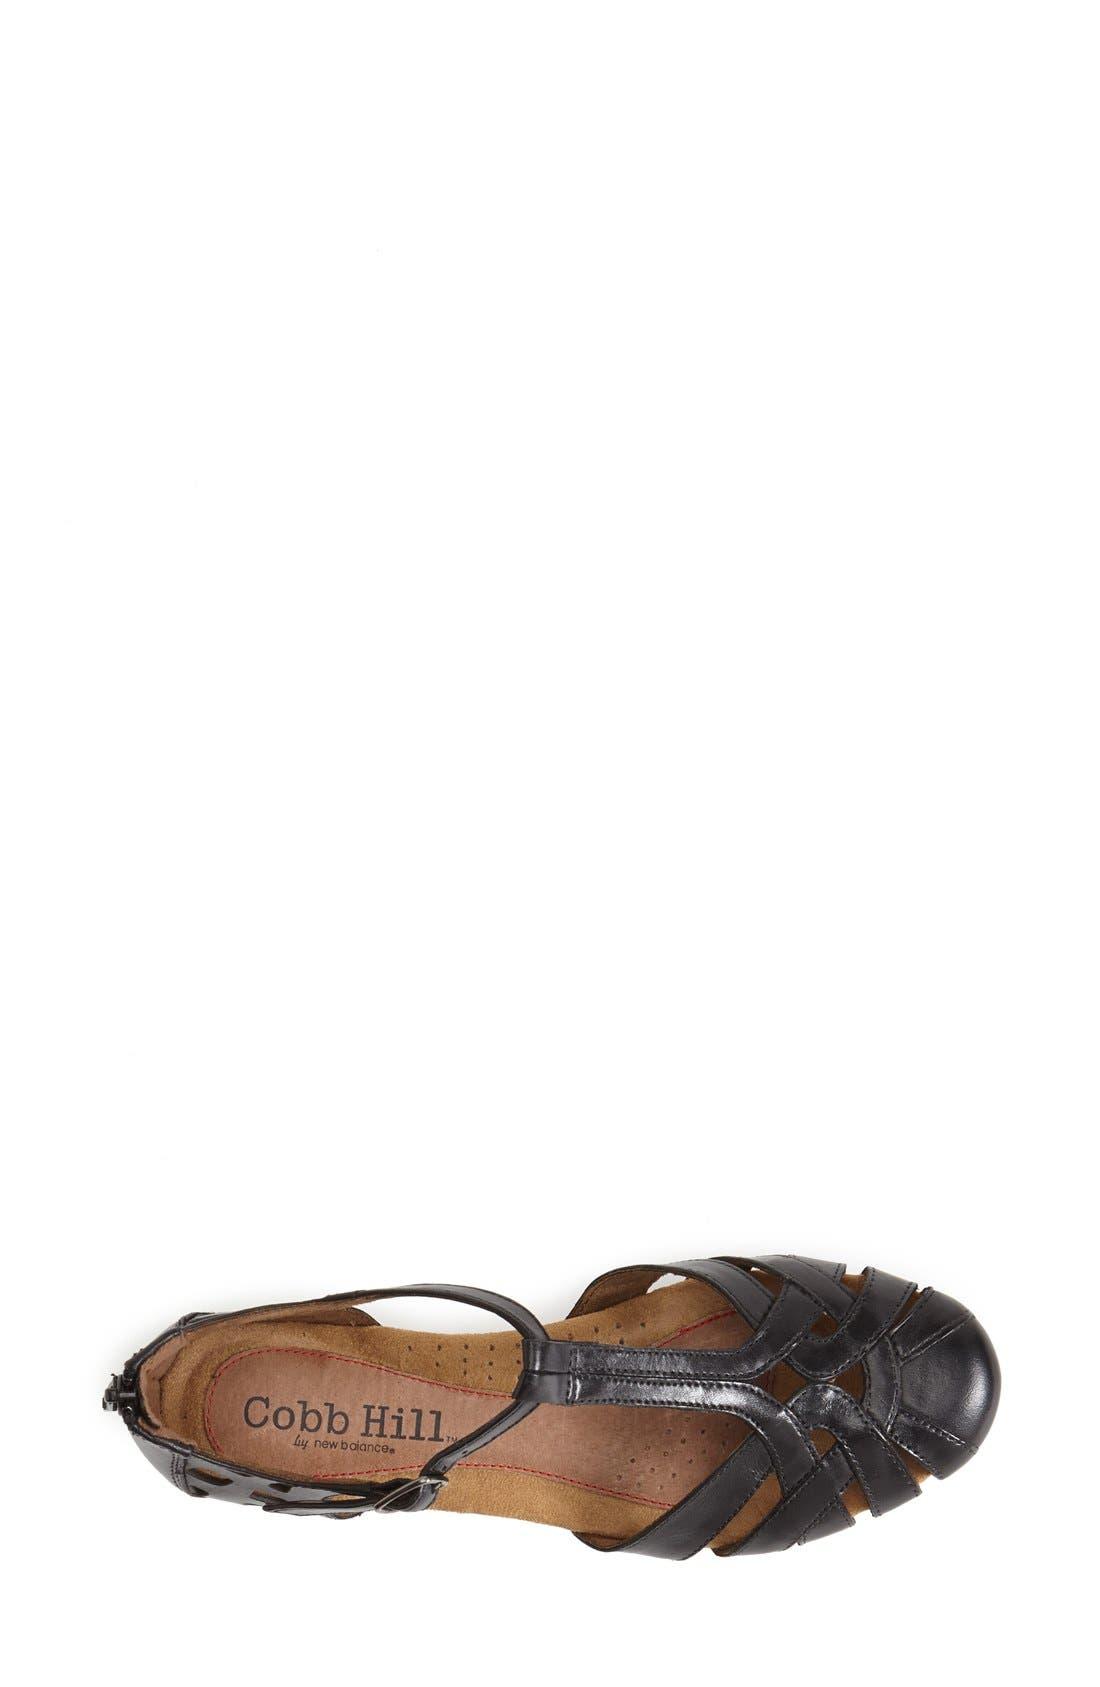 ROCKPORT COBB HILL, 'Ireland' Leather Sandal, Alternate thumbnail 4, color, BLACK